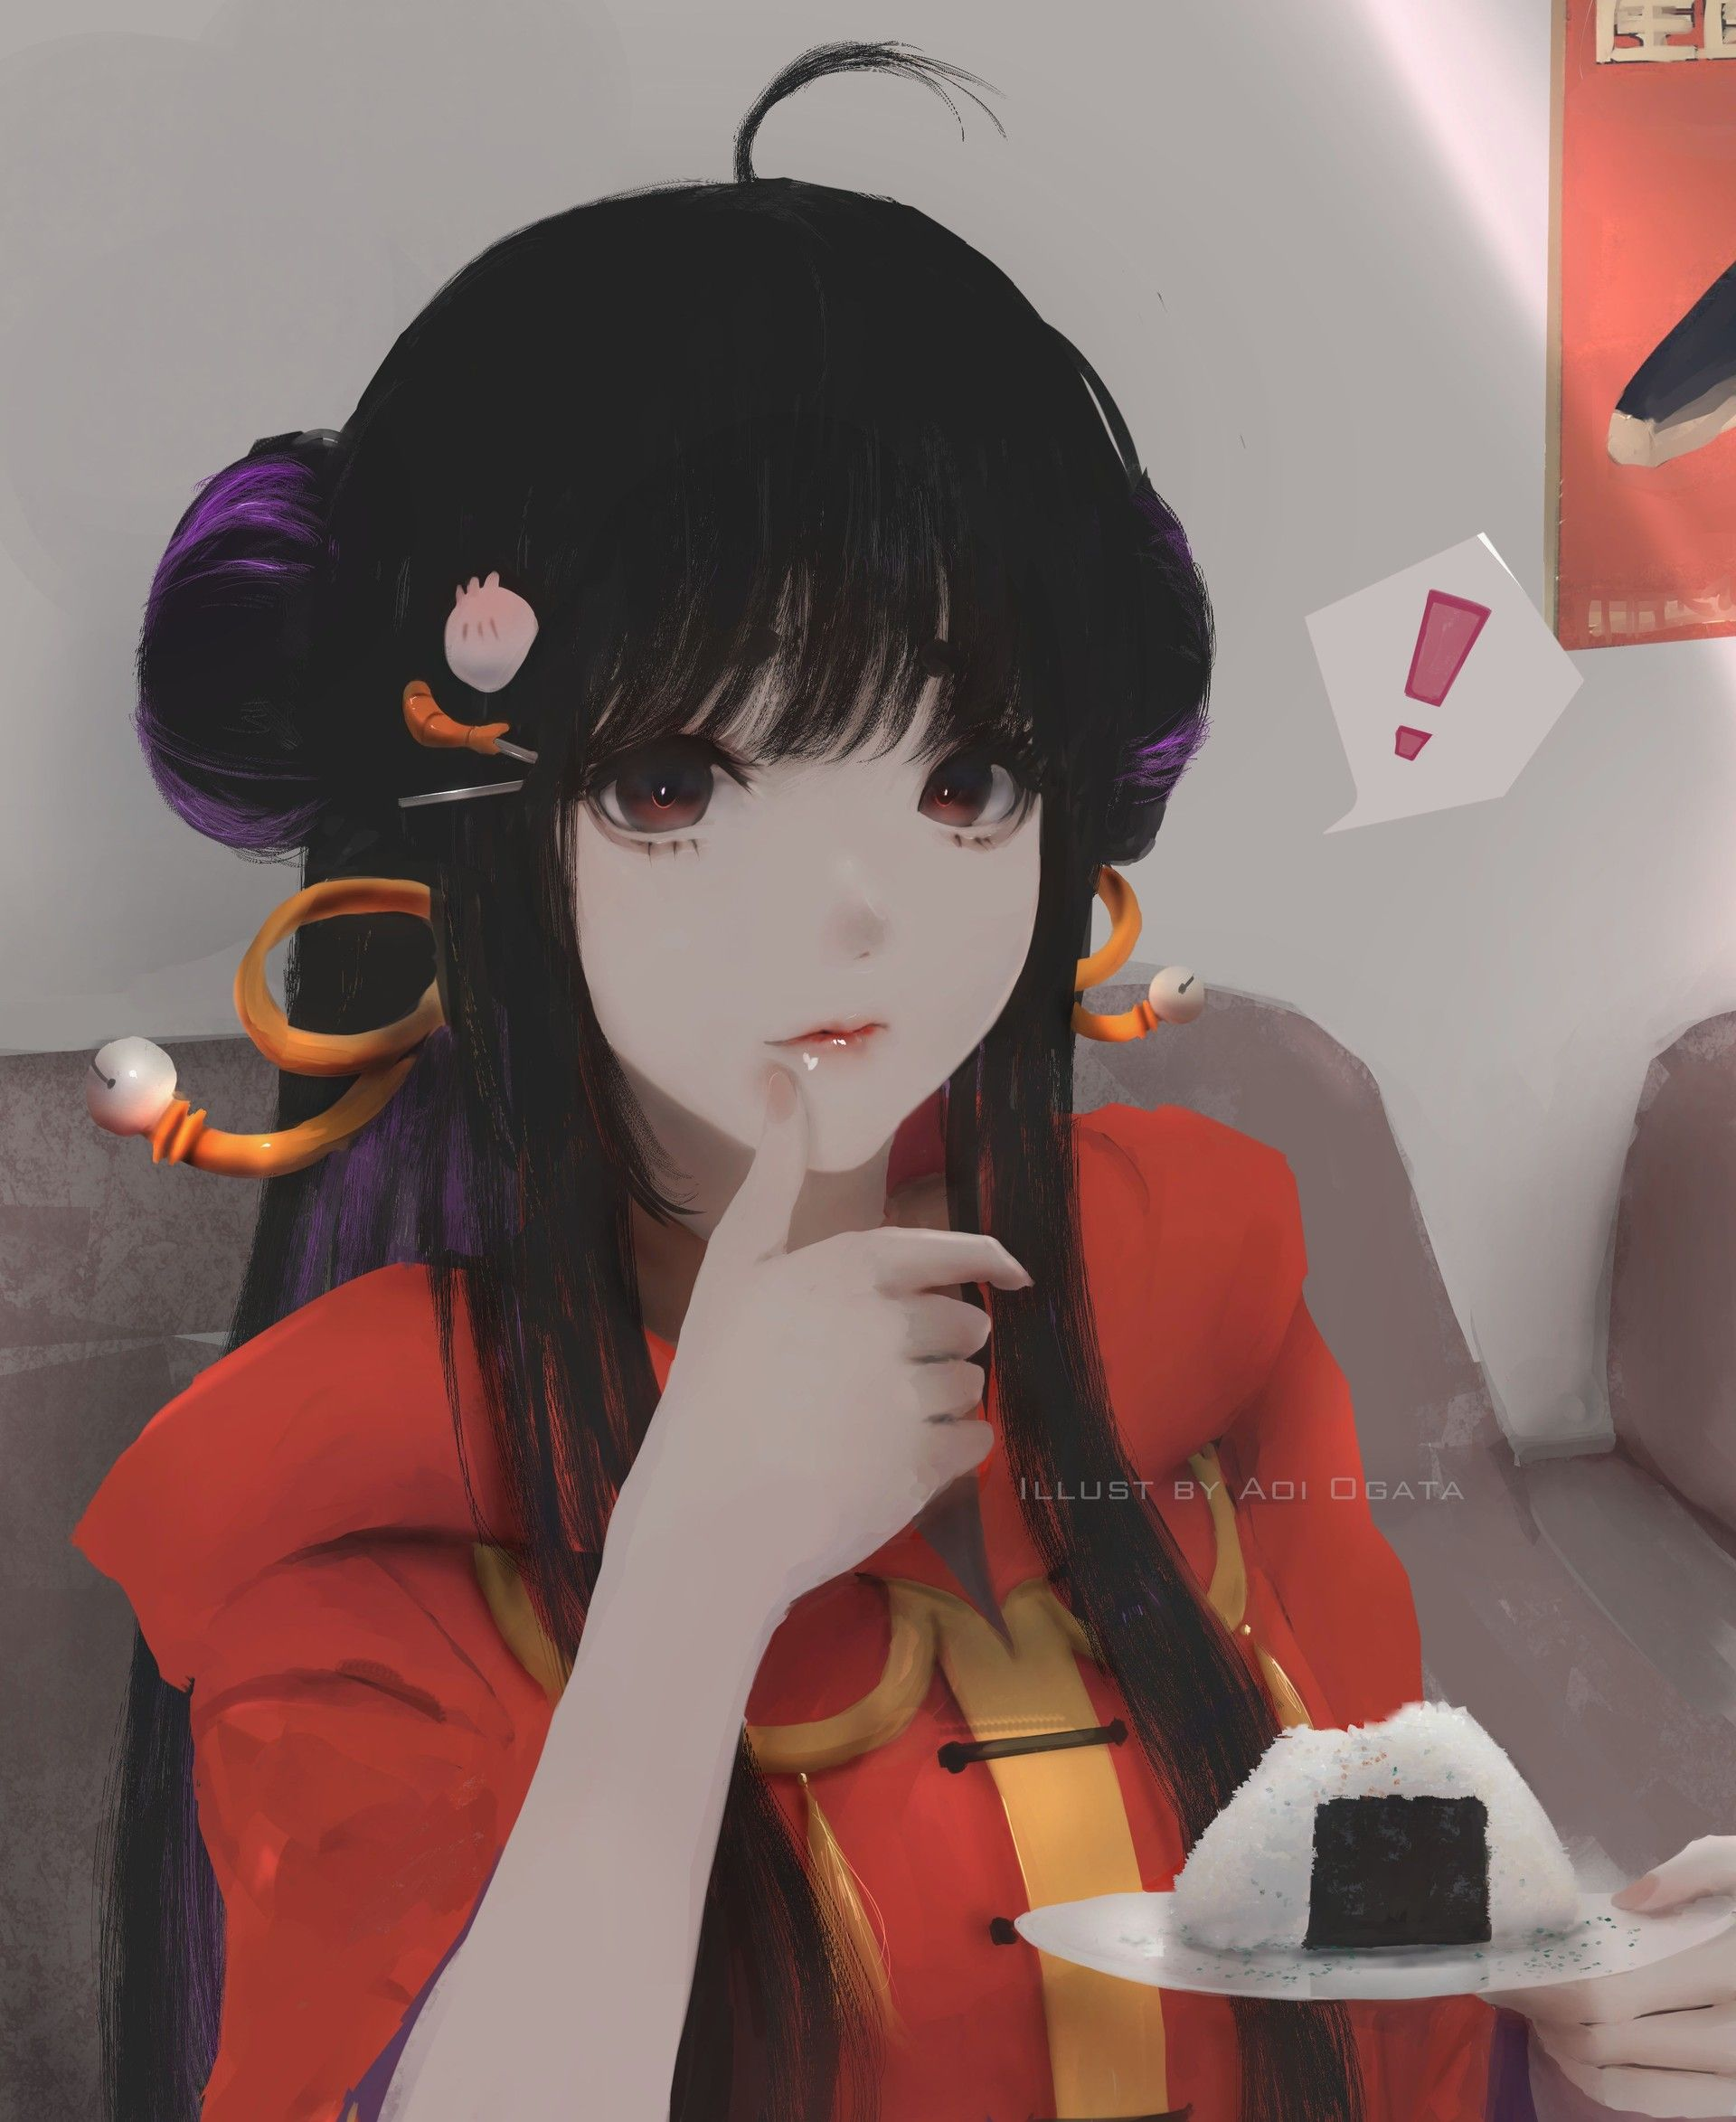 Artstation Hungry Aoi Ogata Risunki Krasivaya Anime Devushka